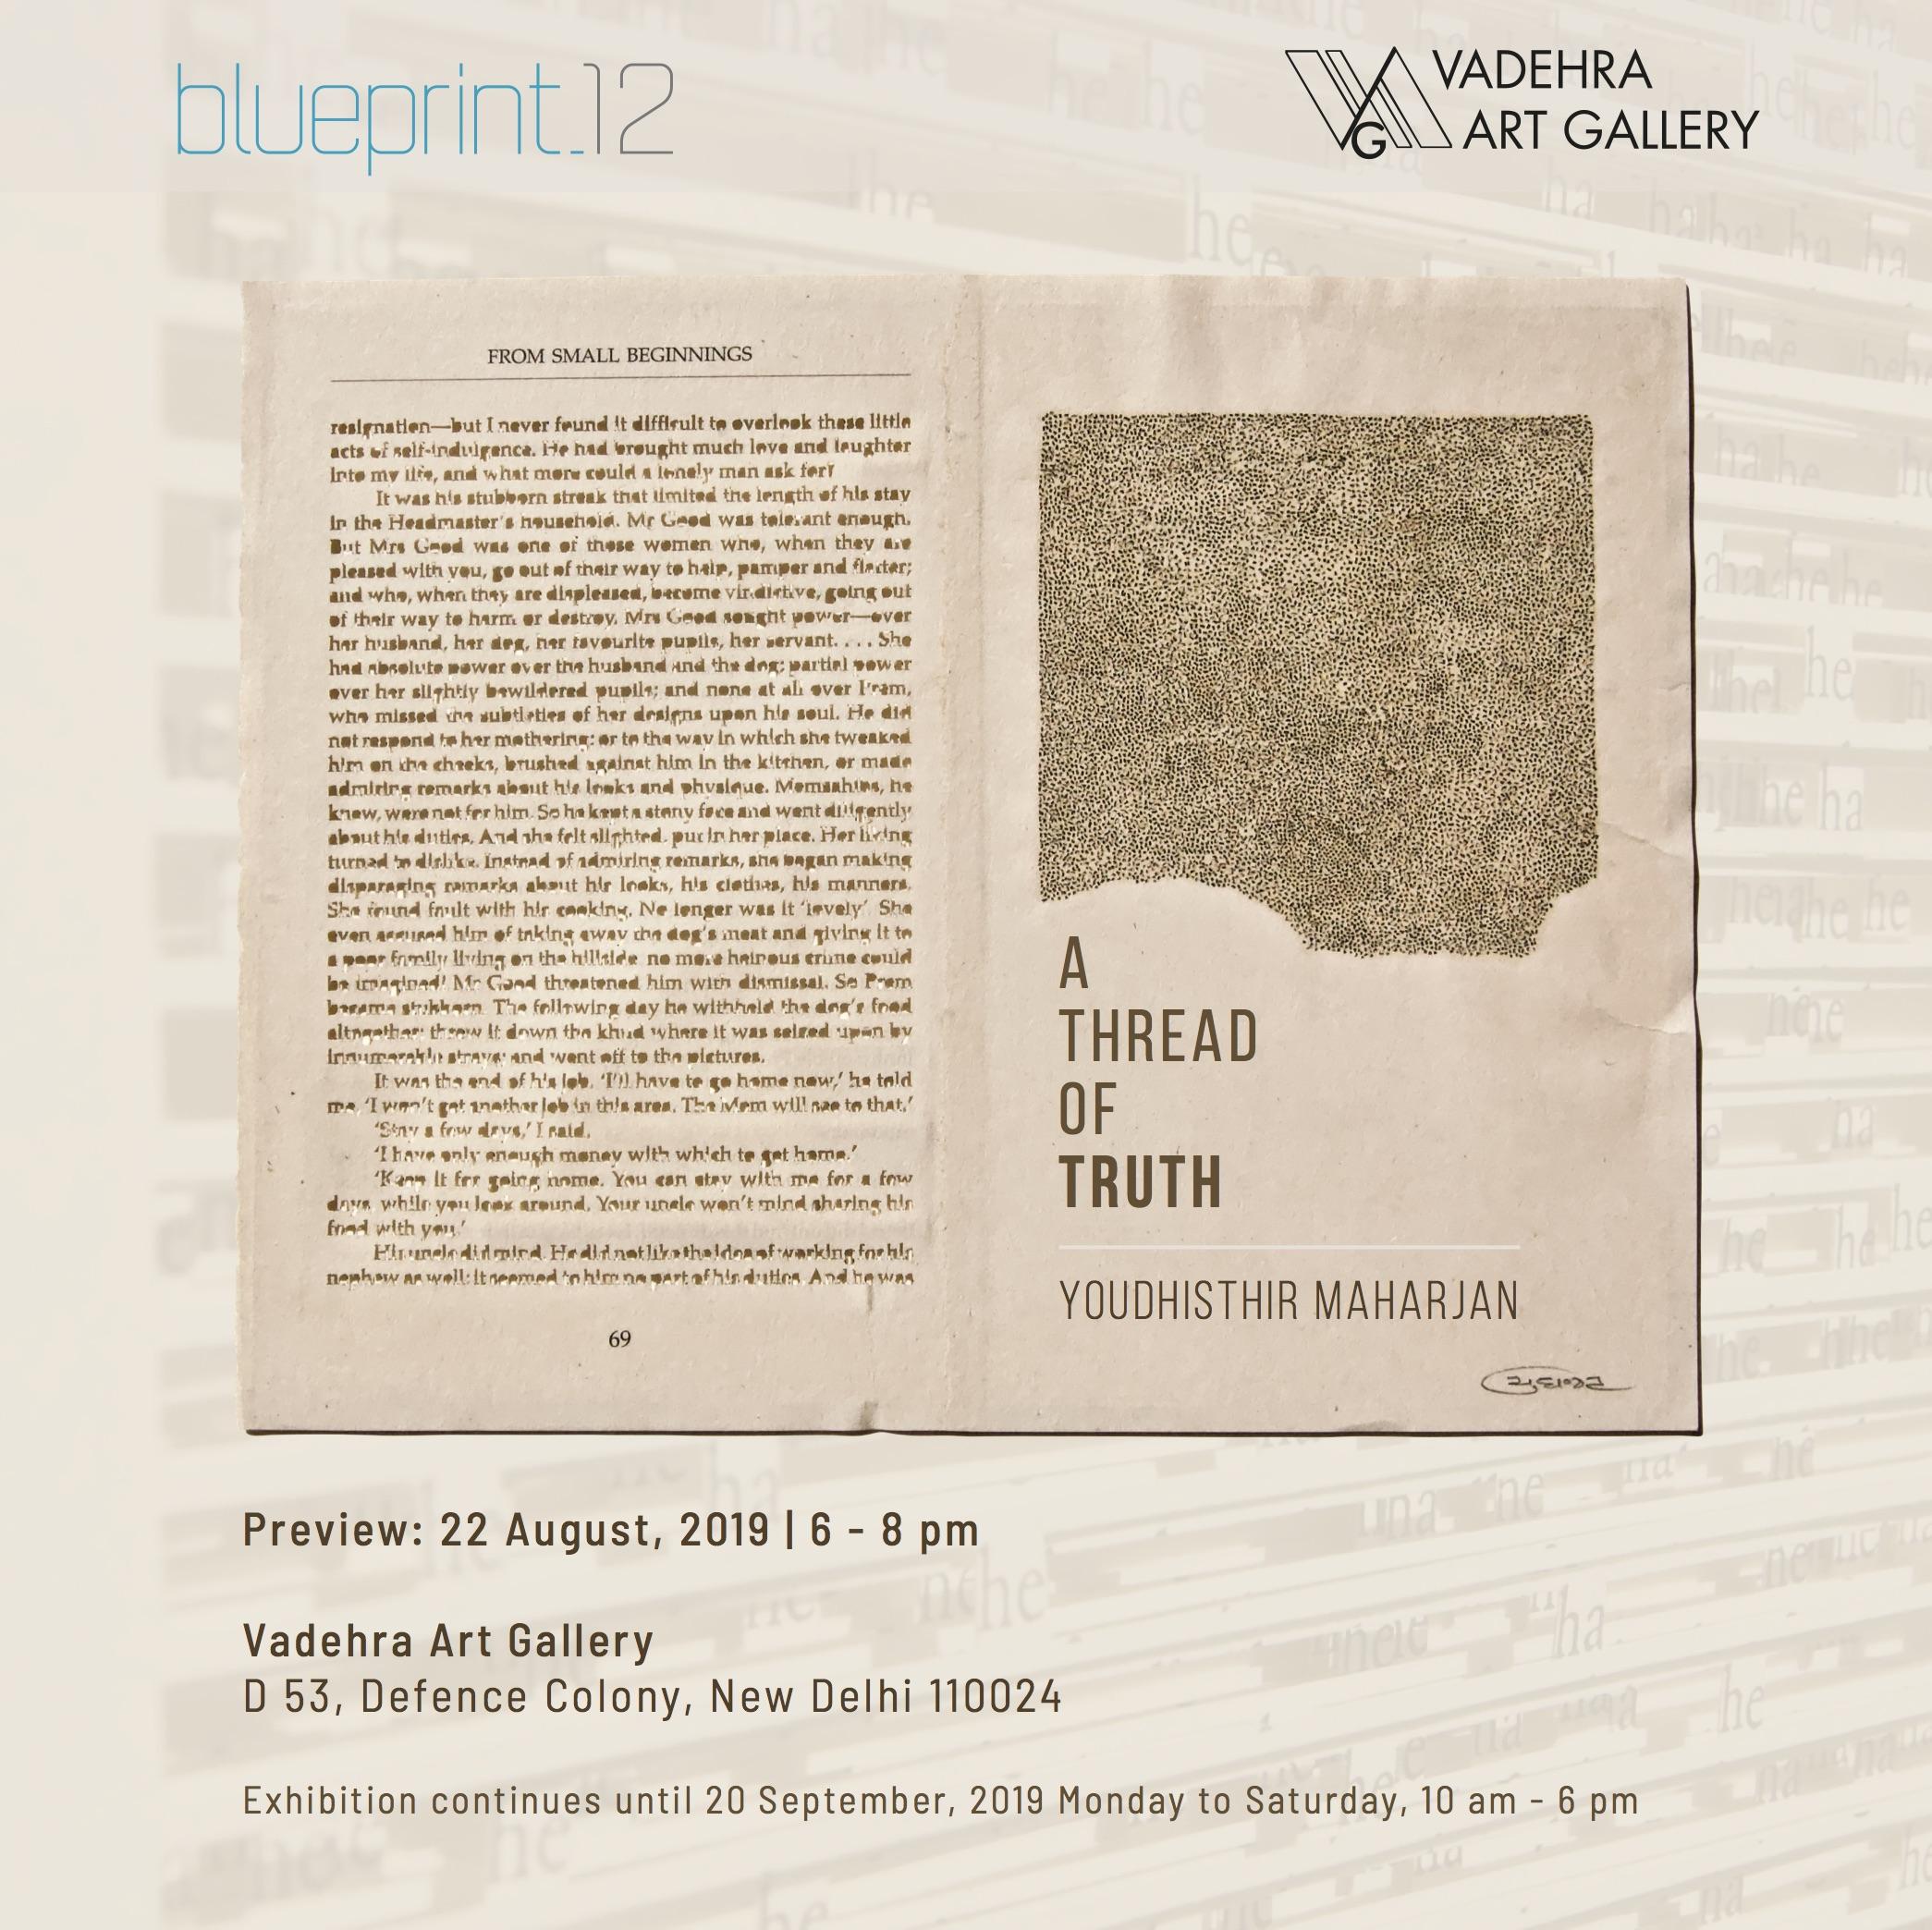 Youdhisthir Maharjan Solo Show, Vadehra Art Gallery